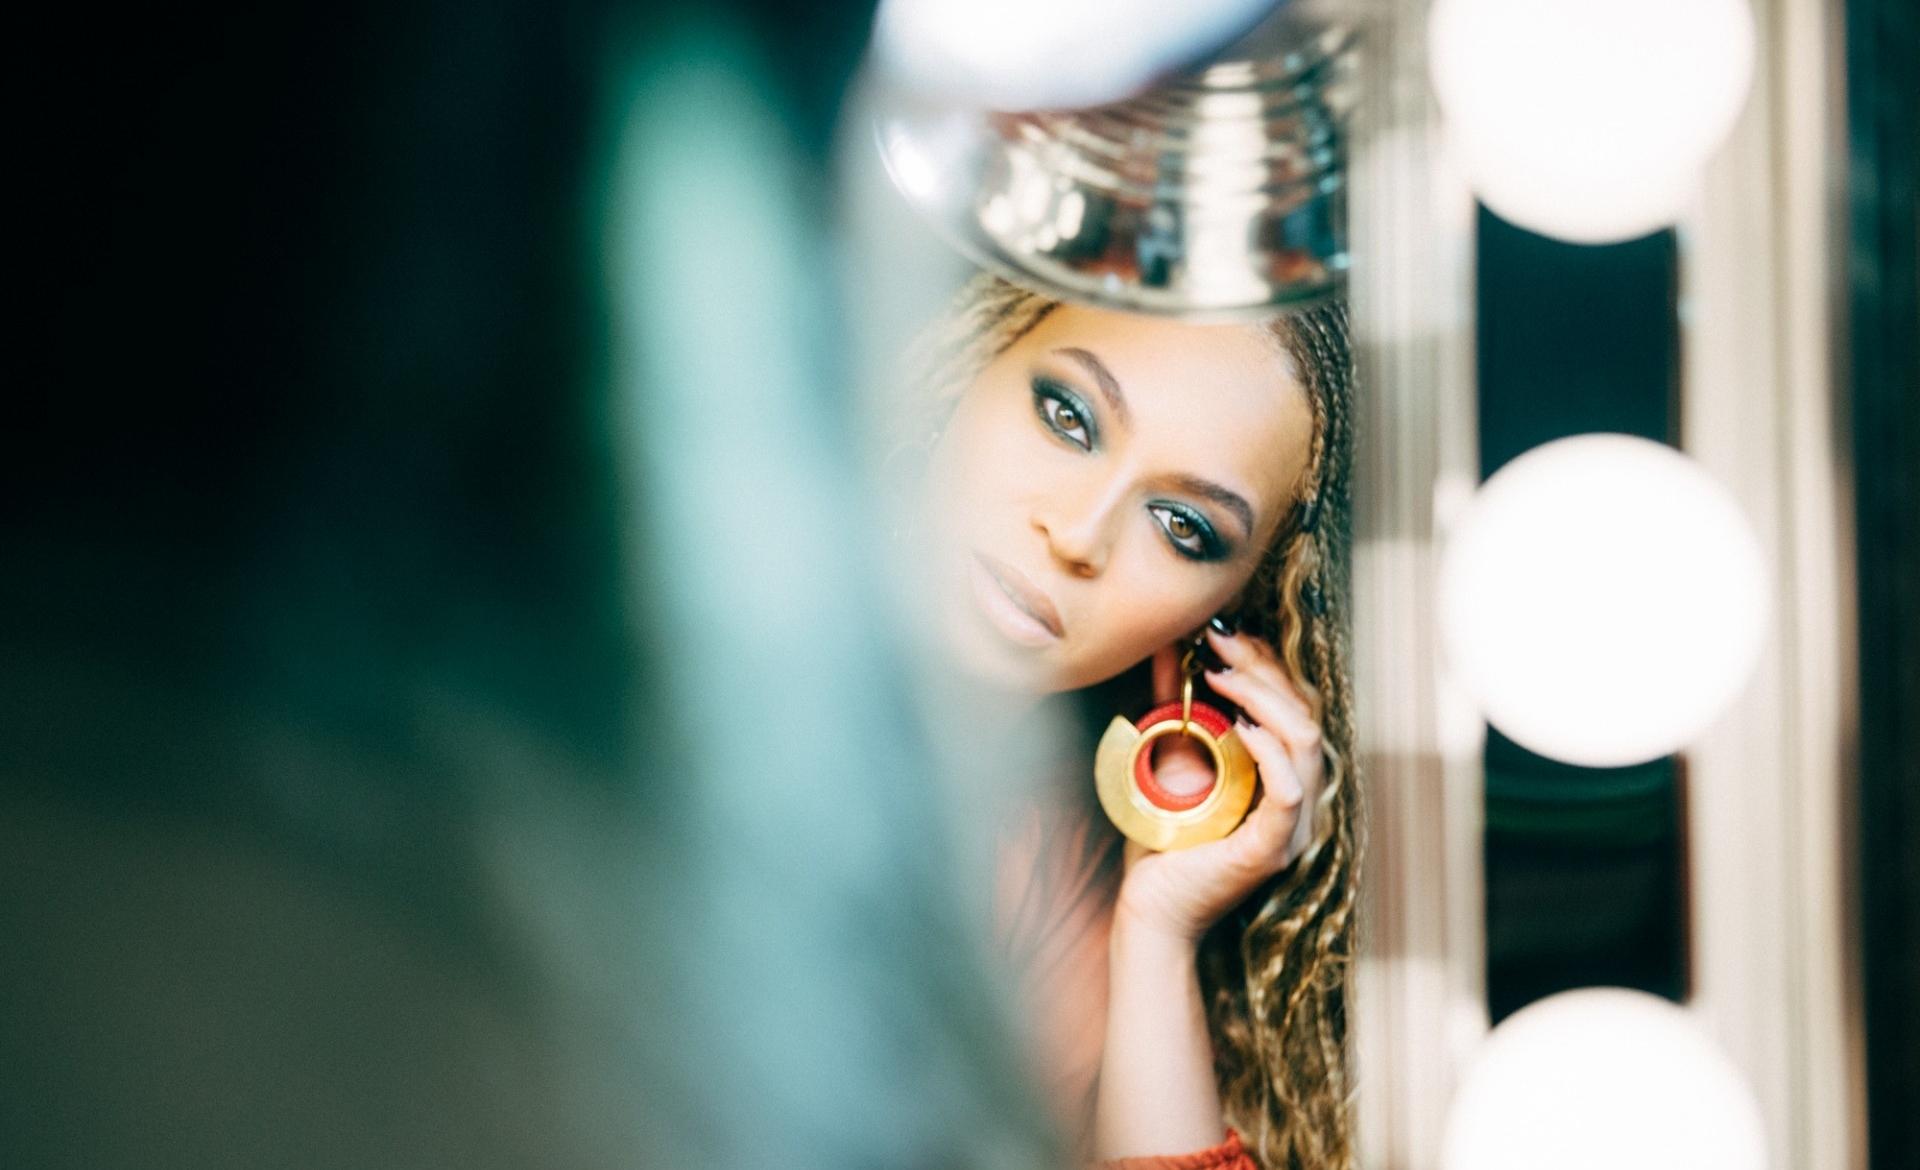 BeyonceCardiff_AW_016.jpg